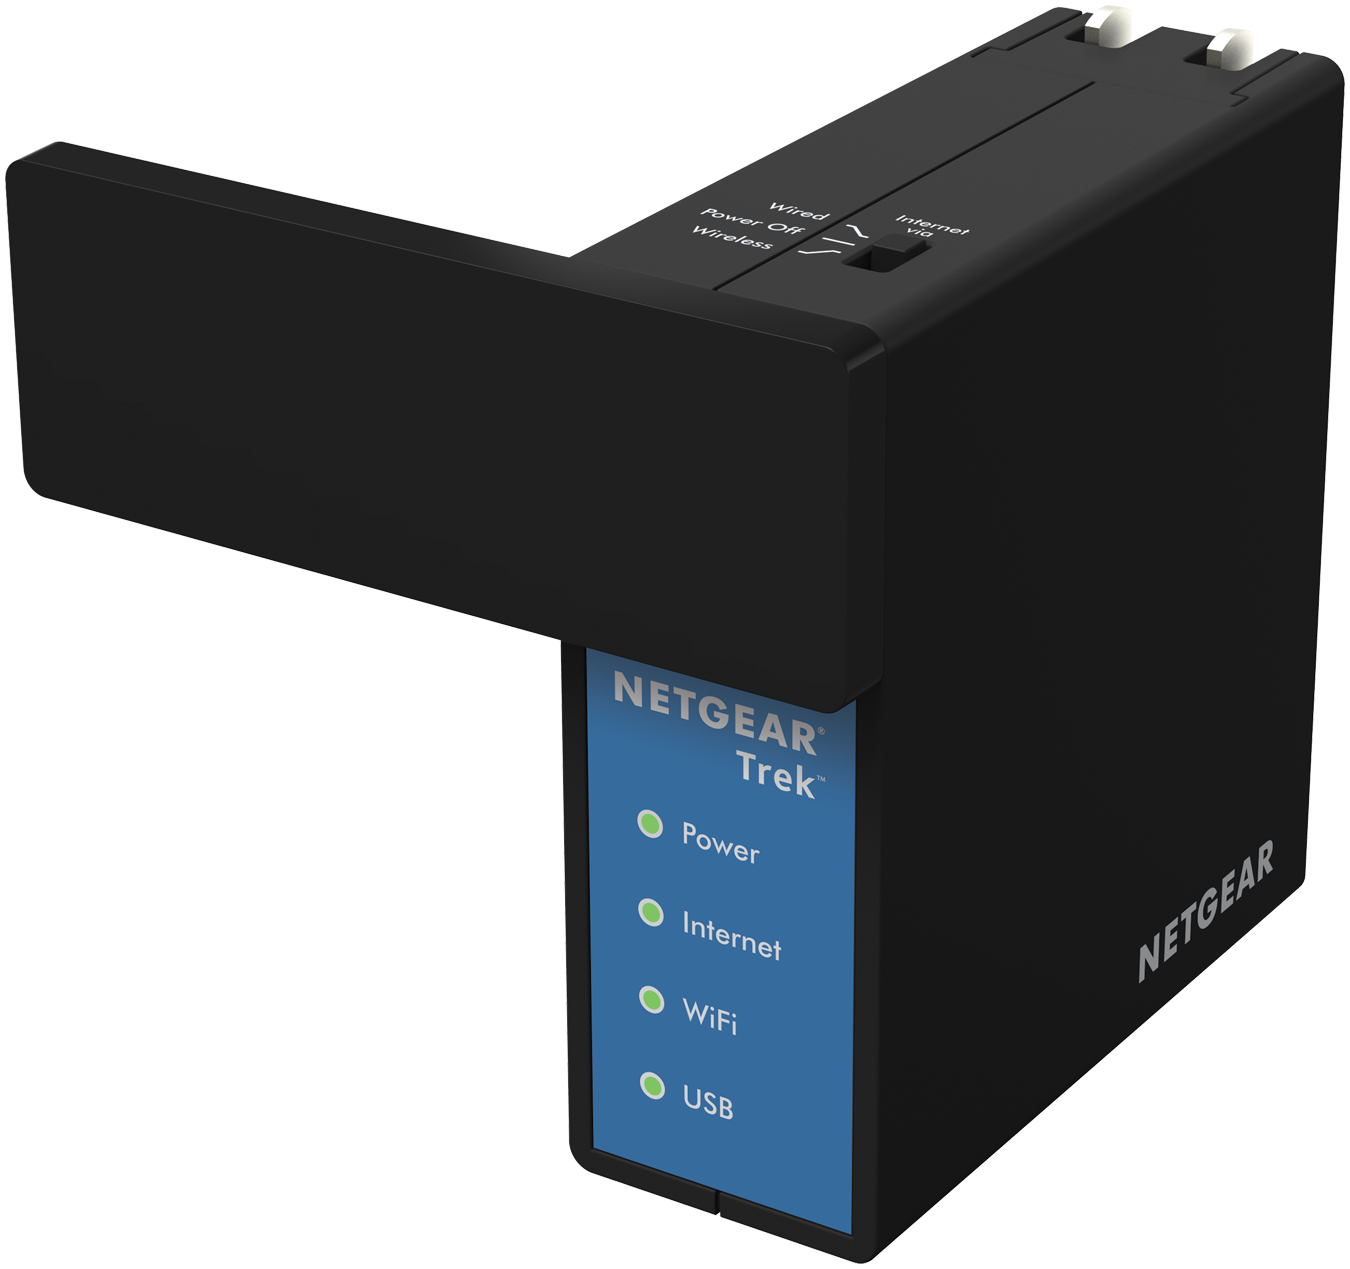 Pr2000 Wifi Routers Networking Home Netgear